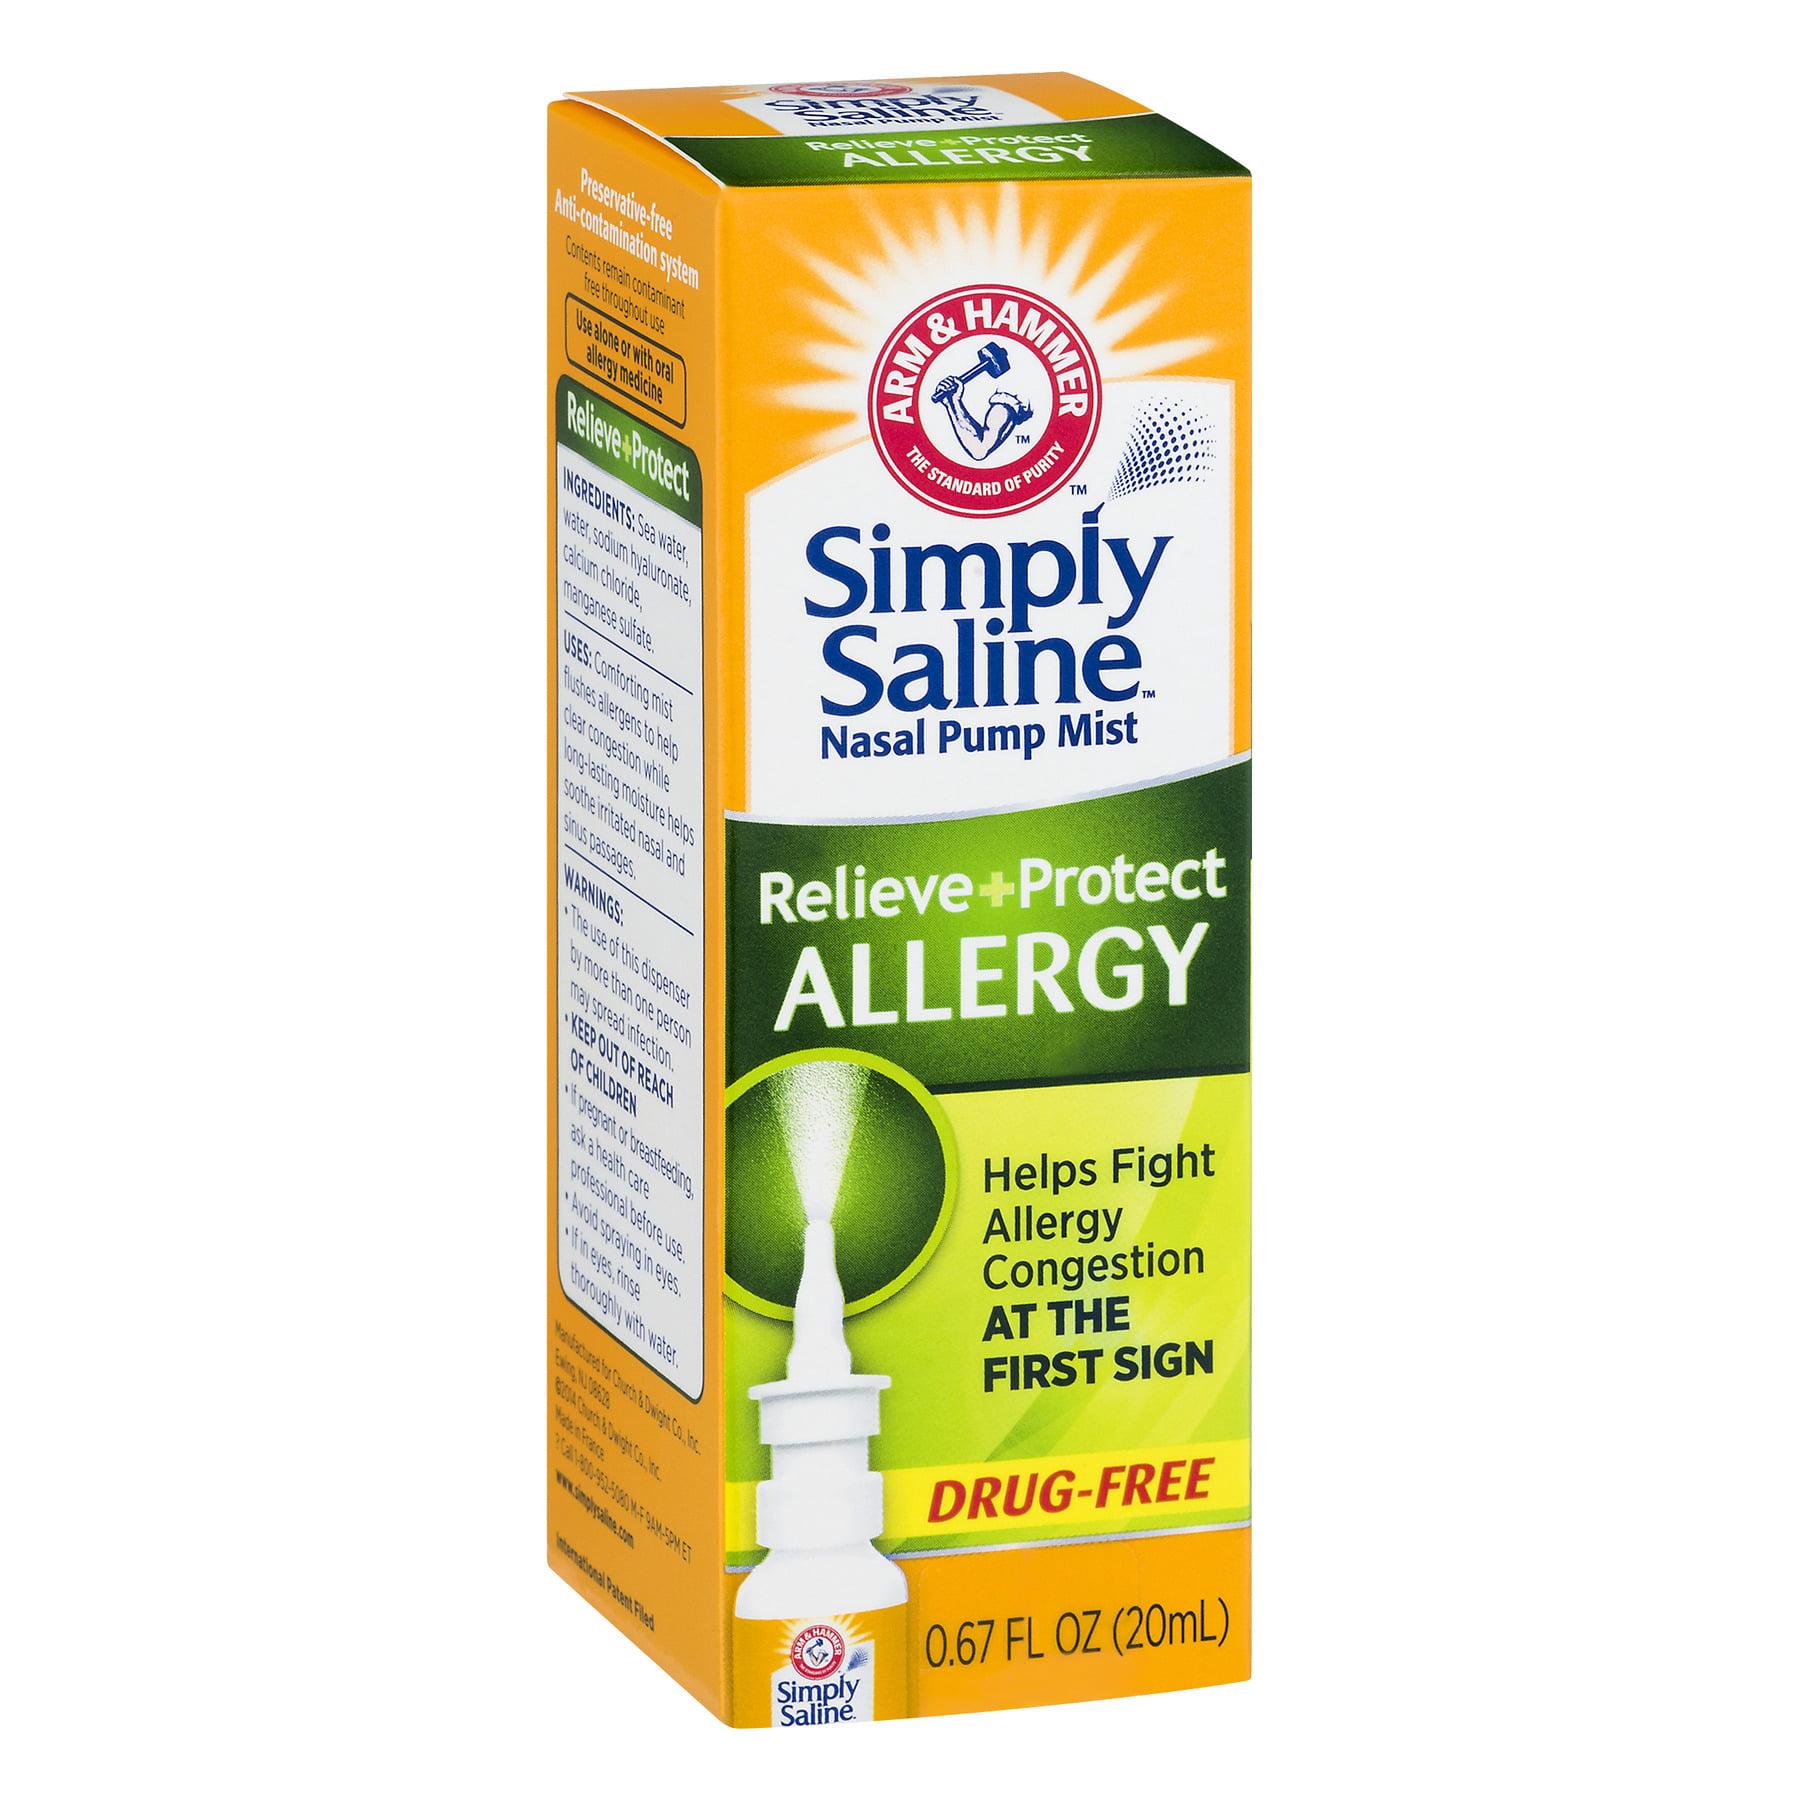 Arm & Hammer™ Simply Saline™ Allergy Nasal Pump Mist 0 67 fl